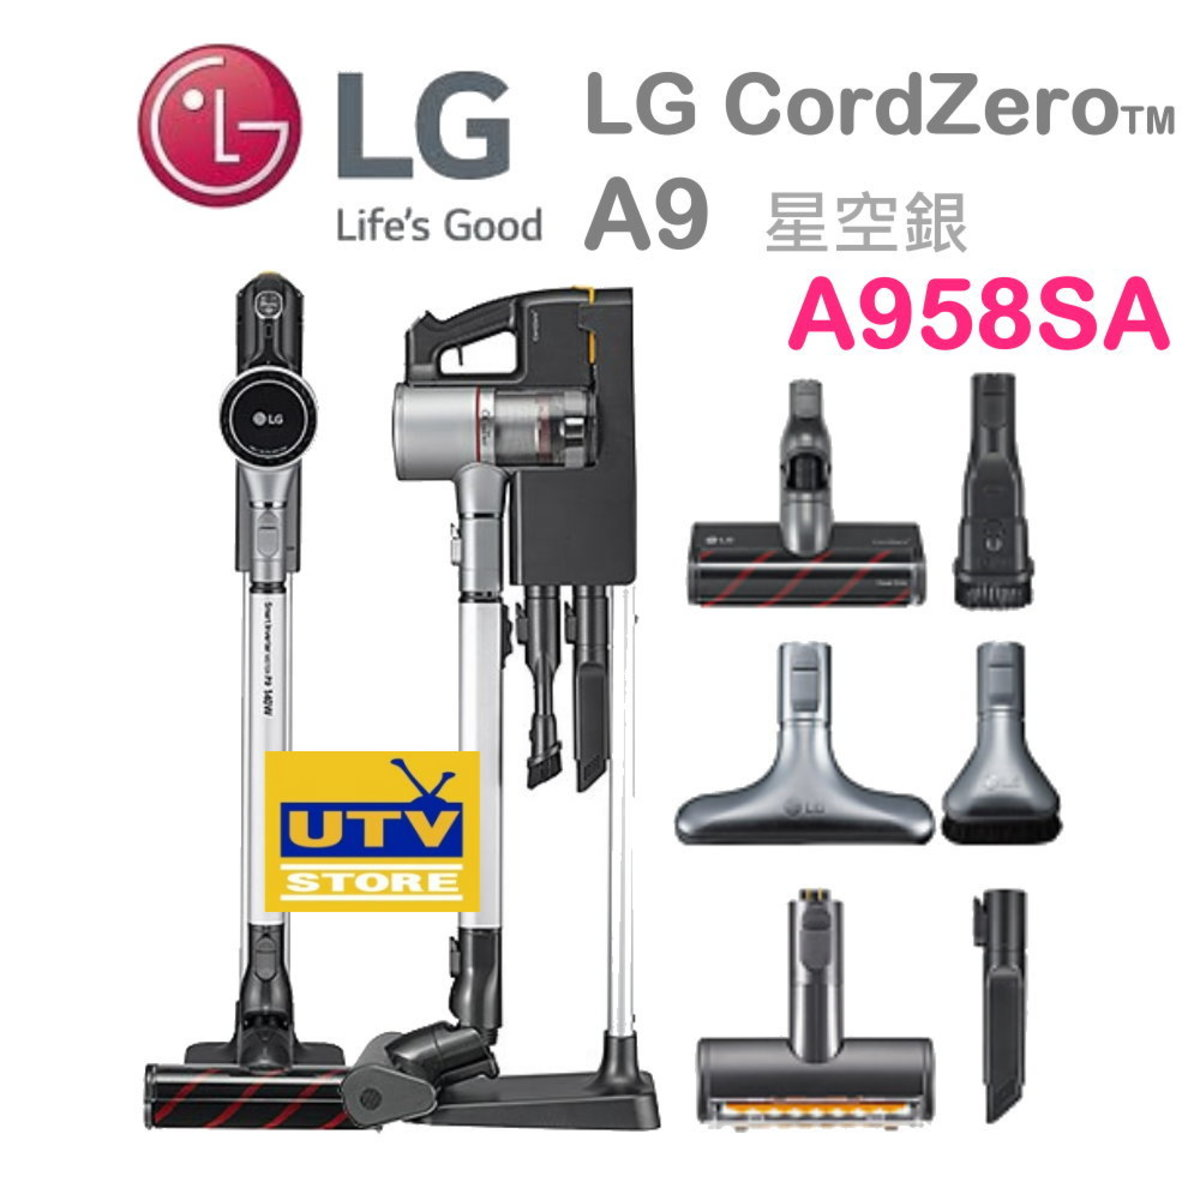 A958SA LG CordZero™ A9 Vacuum Cleaner (Fantasy Silver)